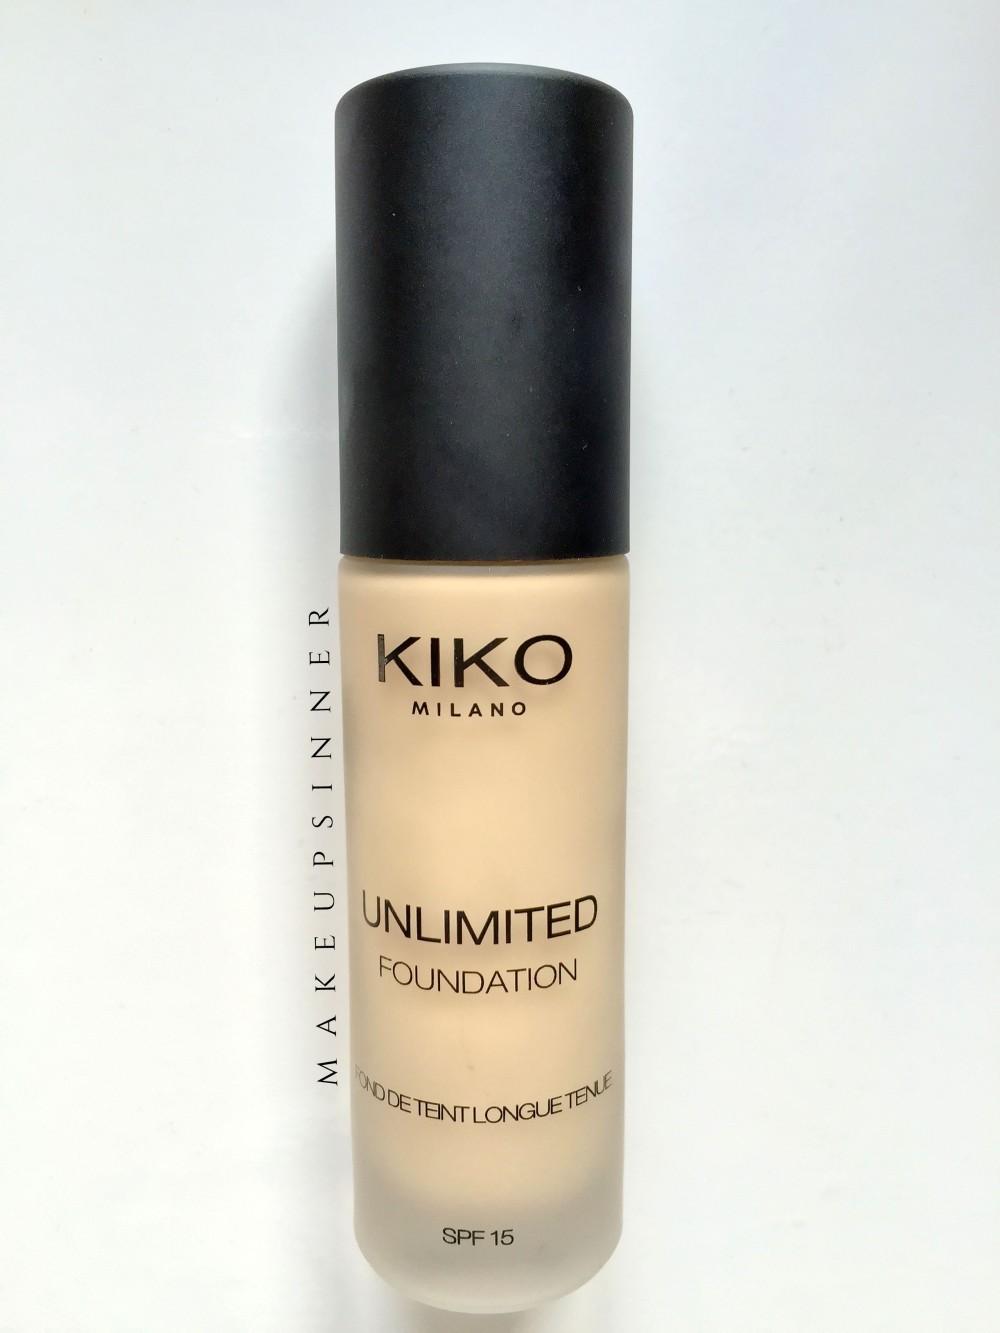 kiko unimited foundation.jpg